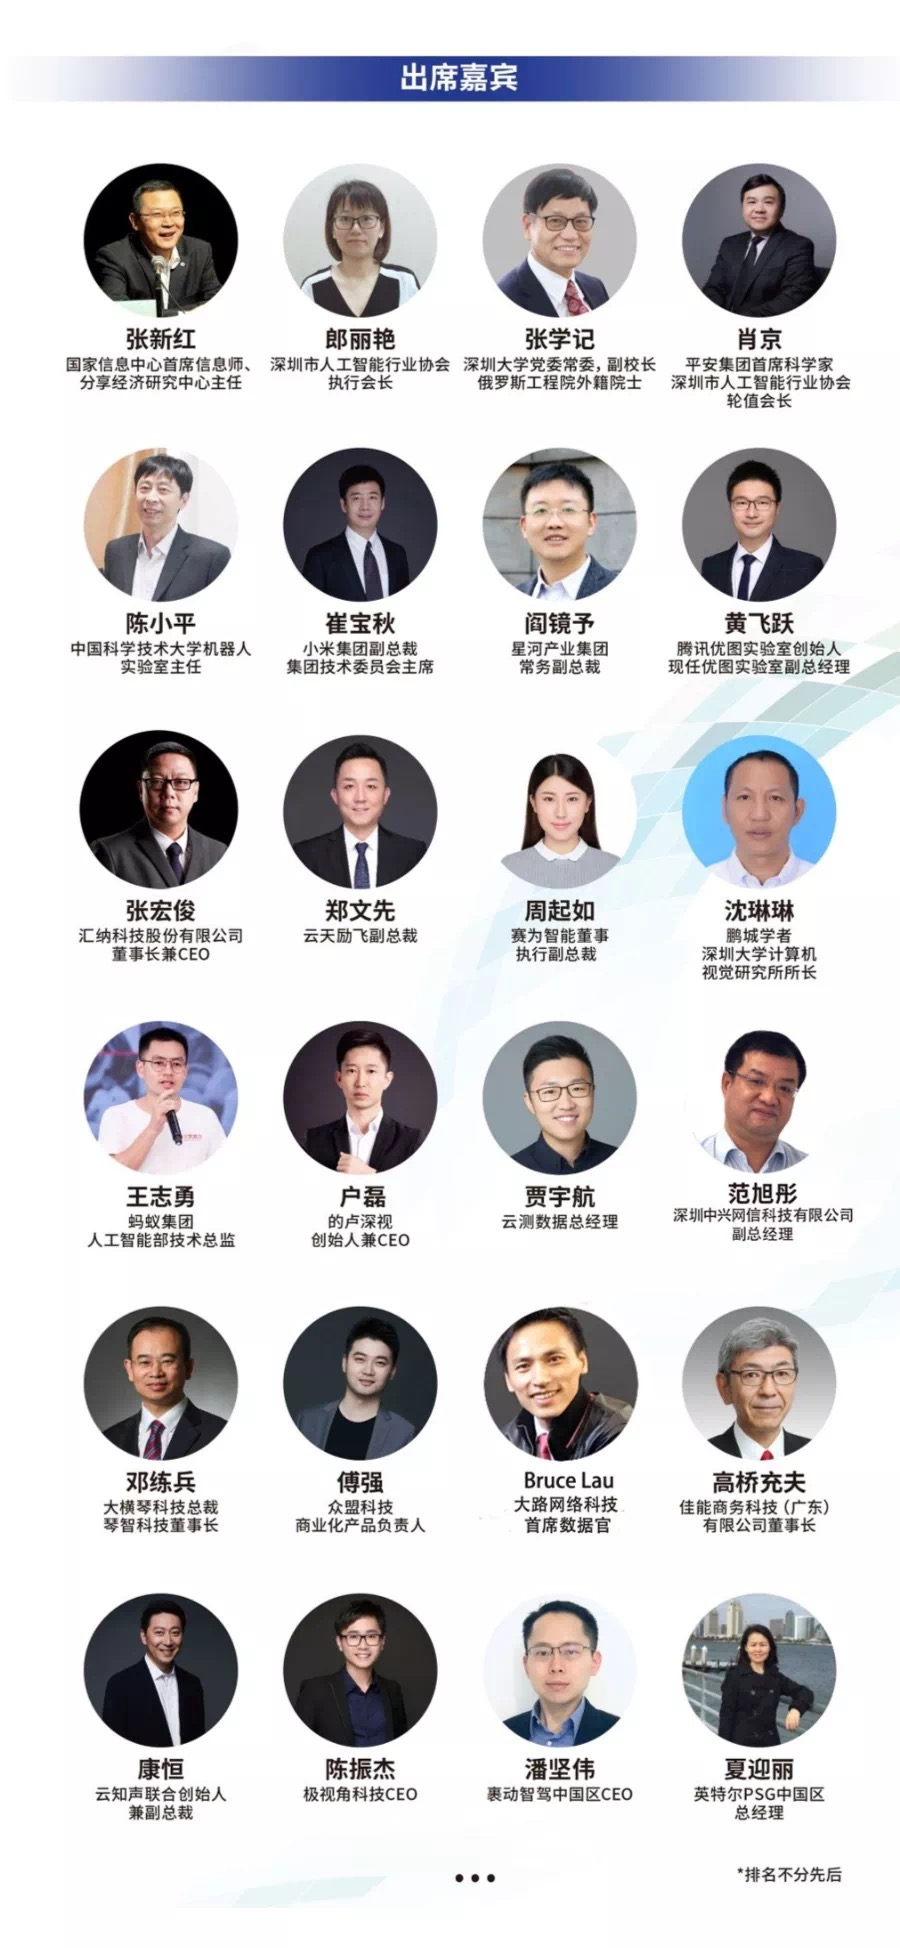 AI+知识产权论坛